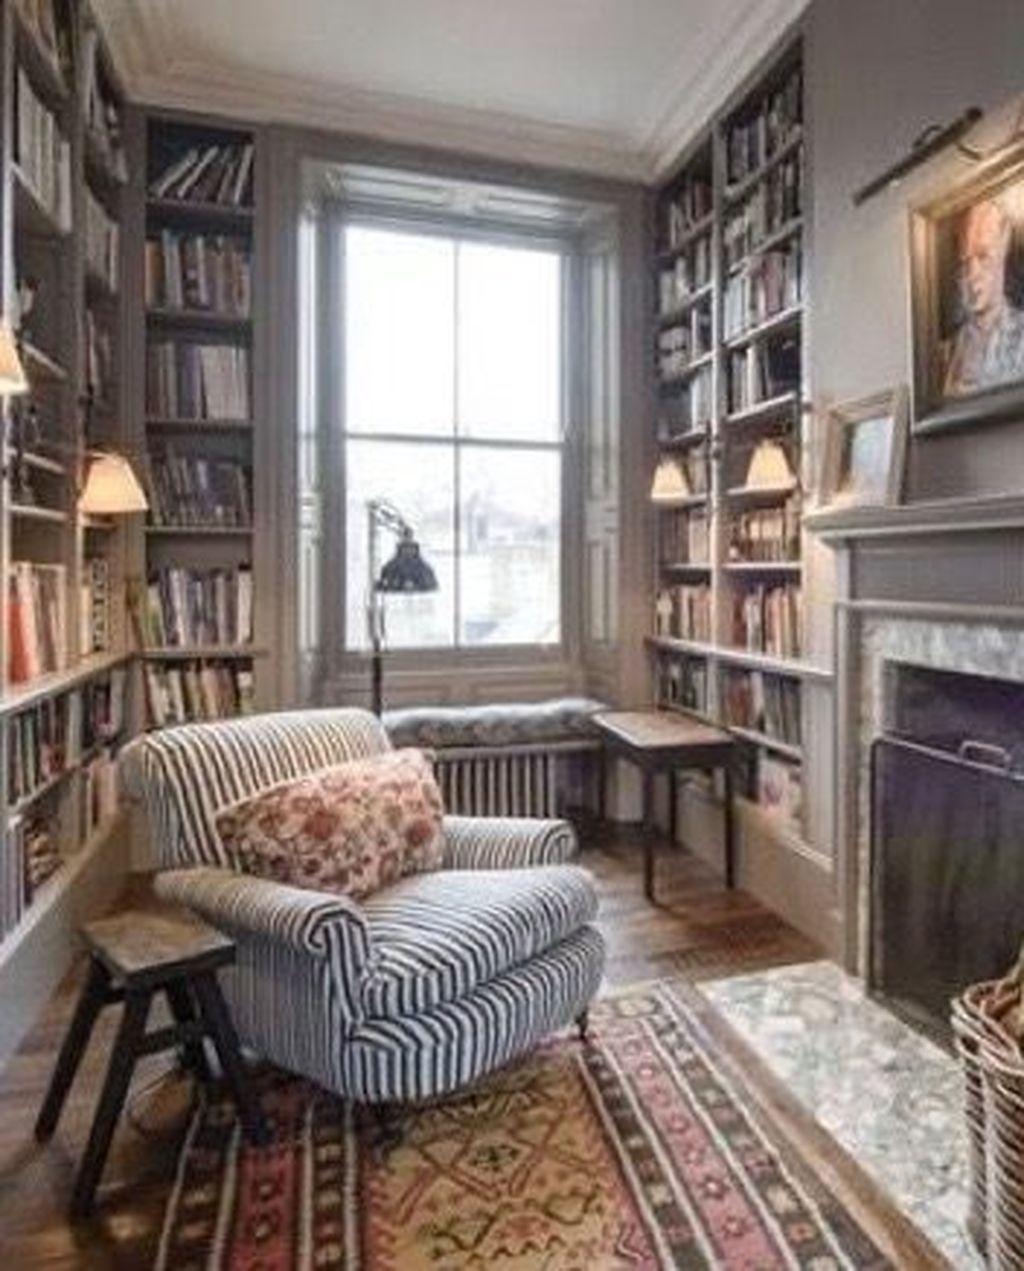 20 Inspiring Reading Room Decor Ideas To Make You Cozy Home Library Design Home Home Libraries